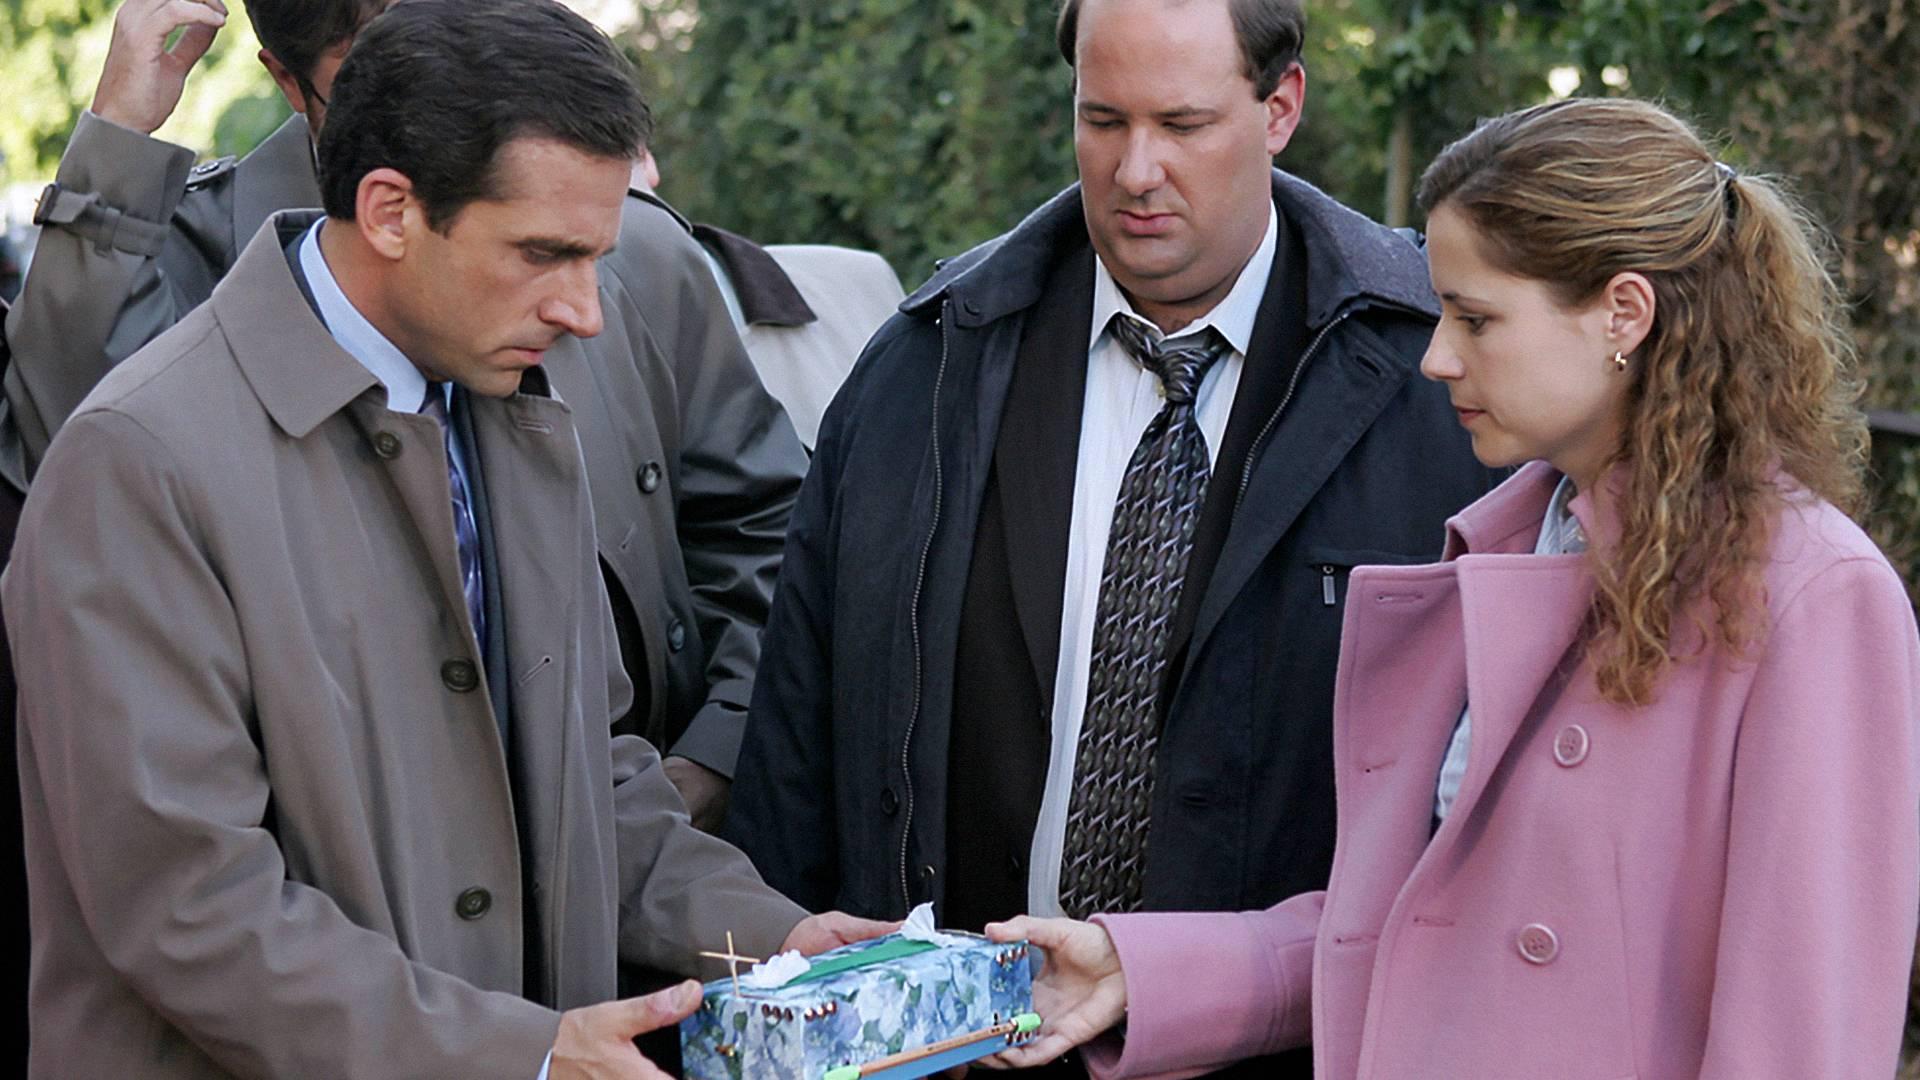 The Office Season 3 Episode 4